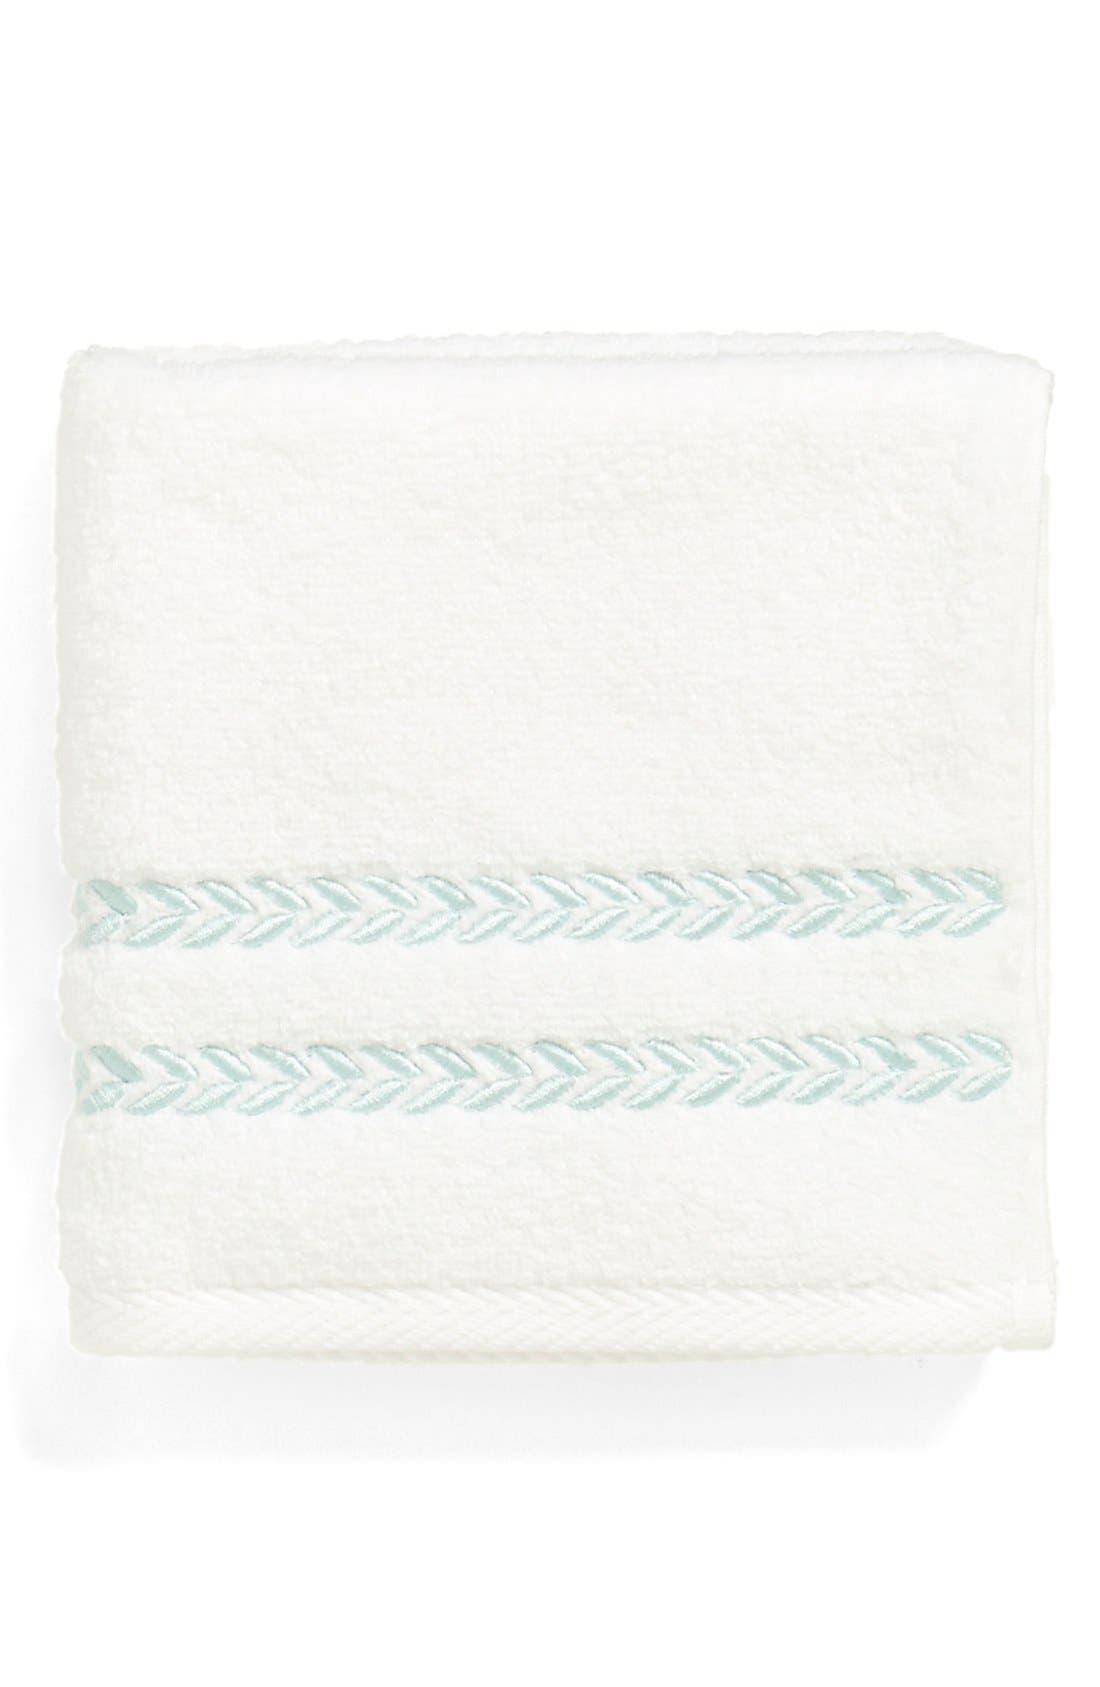 'Pearl Essence' Wash Towel,                             Main thumbnail 4, color,